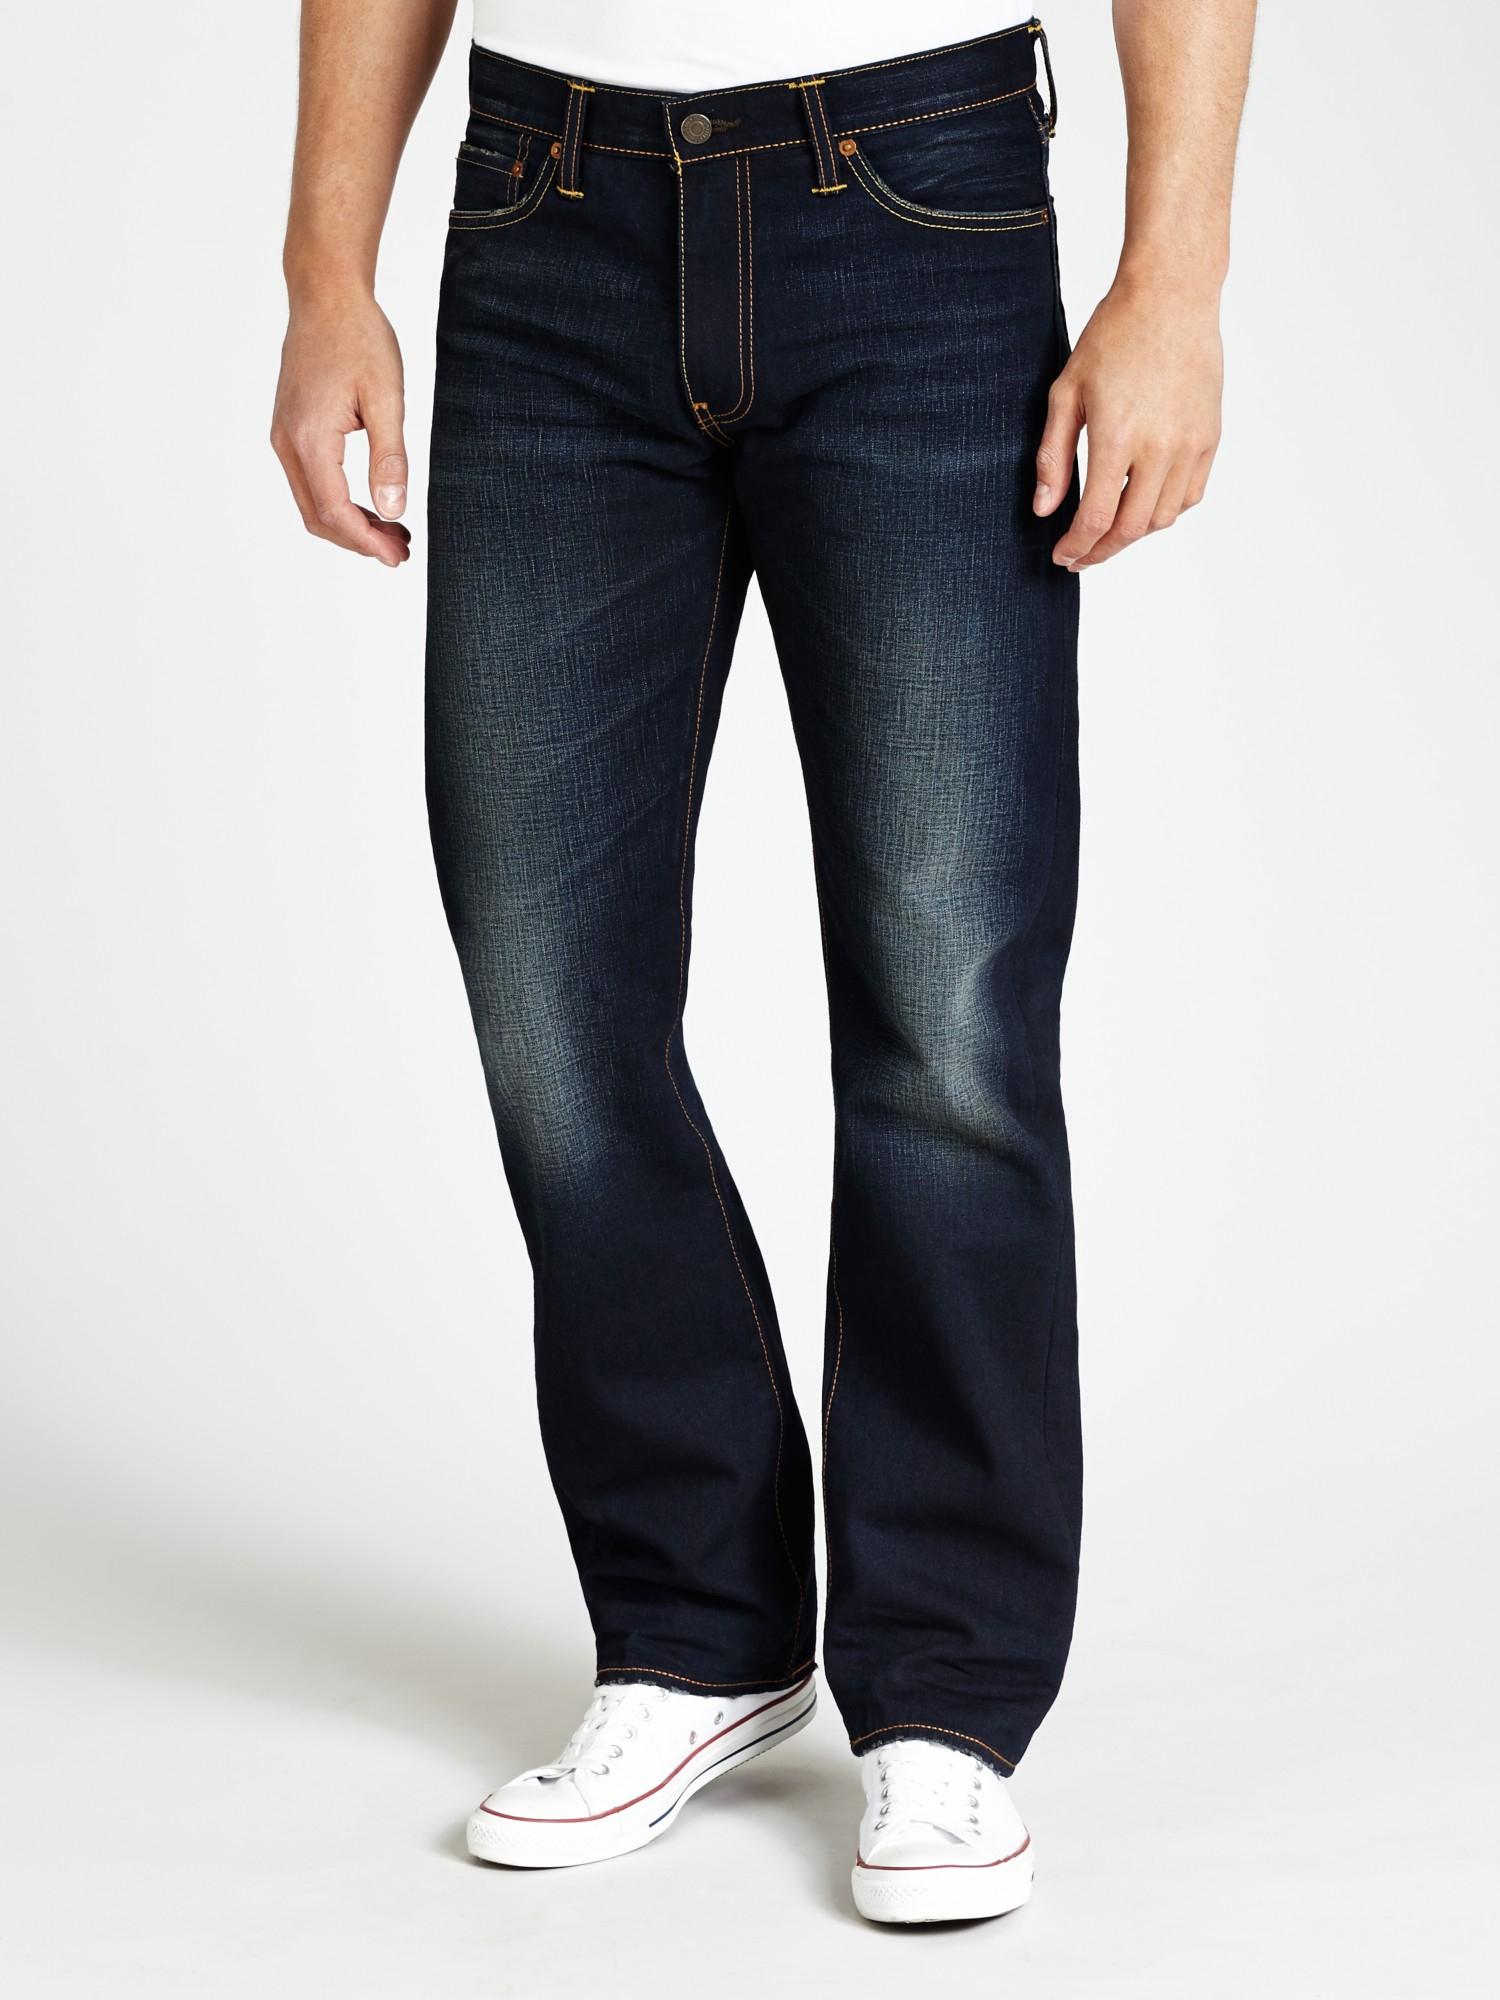 Levi's Denim Pants in Blue for Men